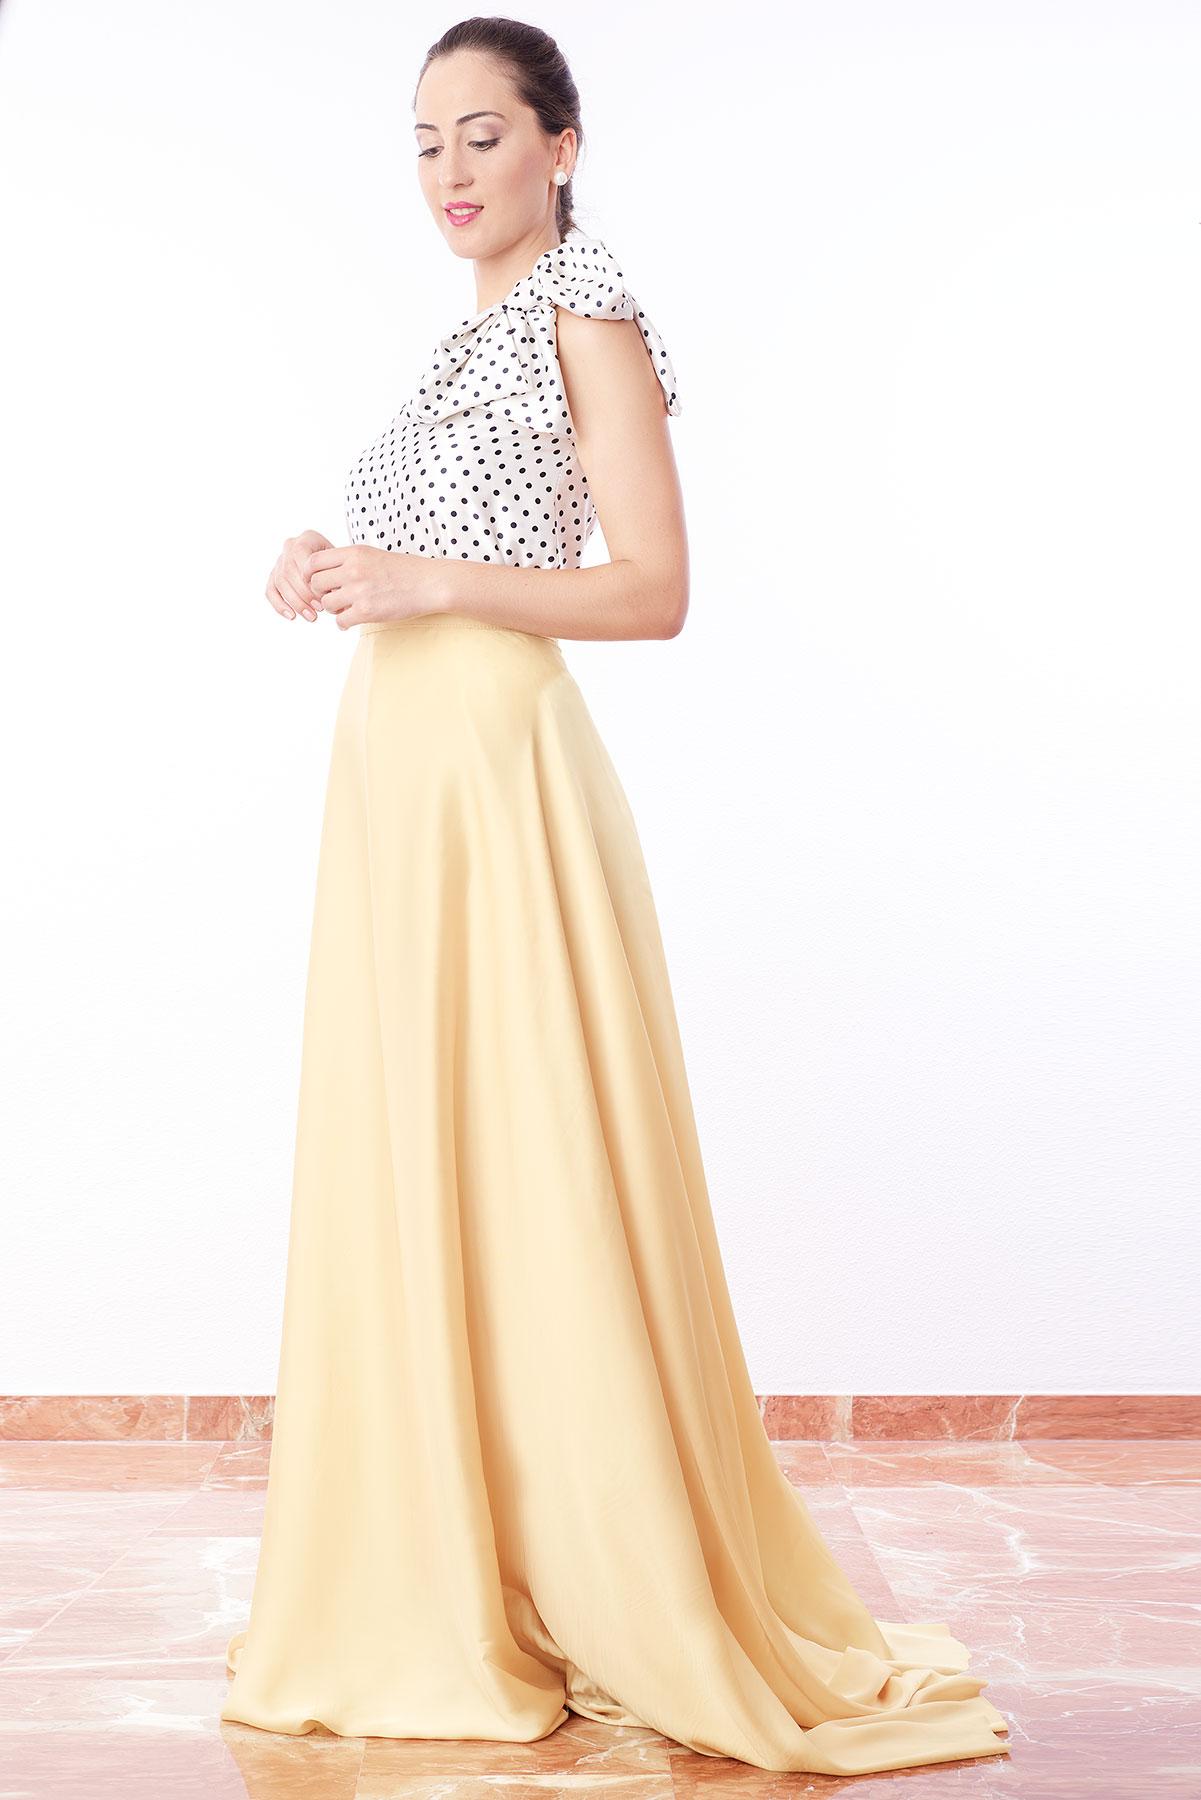 falda de fiesta larga amarilla larga diseñada por Fatima Angulo